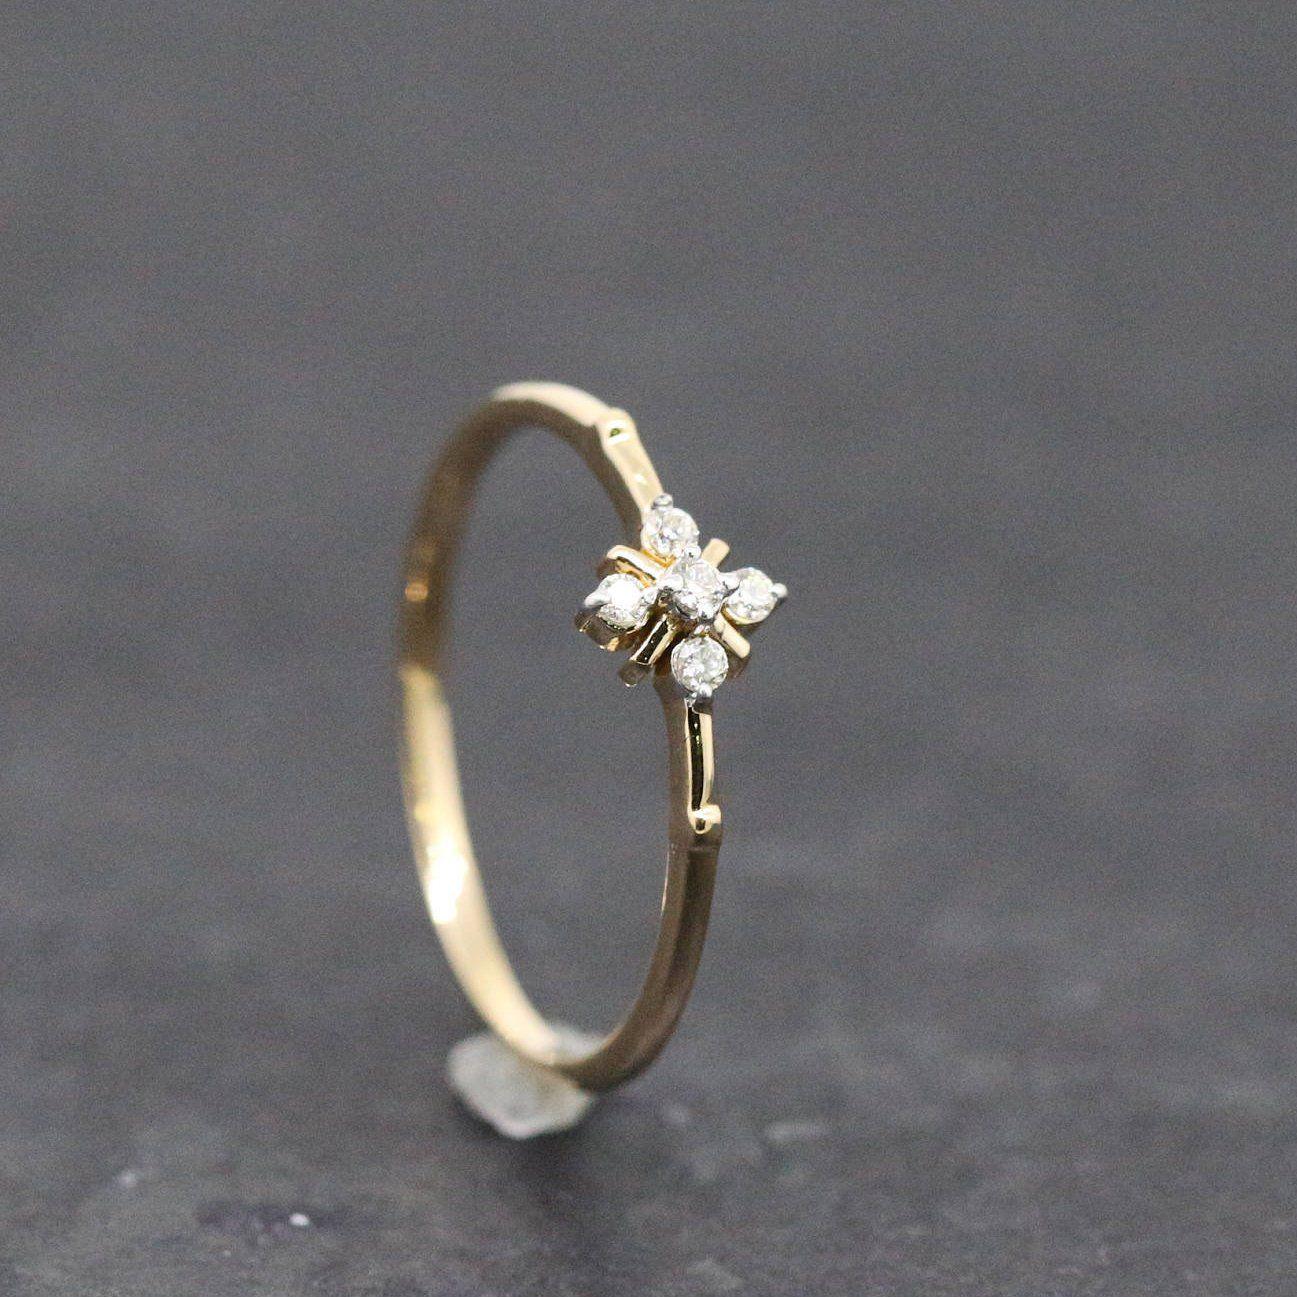 5 Stone Diamond Ring Small Diamond Ring Petite Diamond Ring Diamond Ring Gift Small Diamond Rings 14k White Gold Diamond Ring Aquamarine Engagement Ring